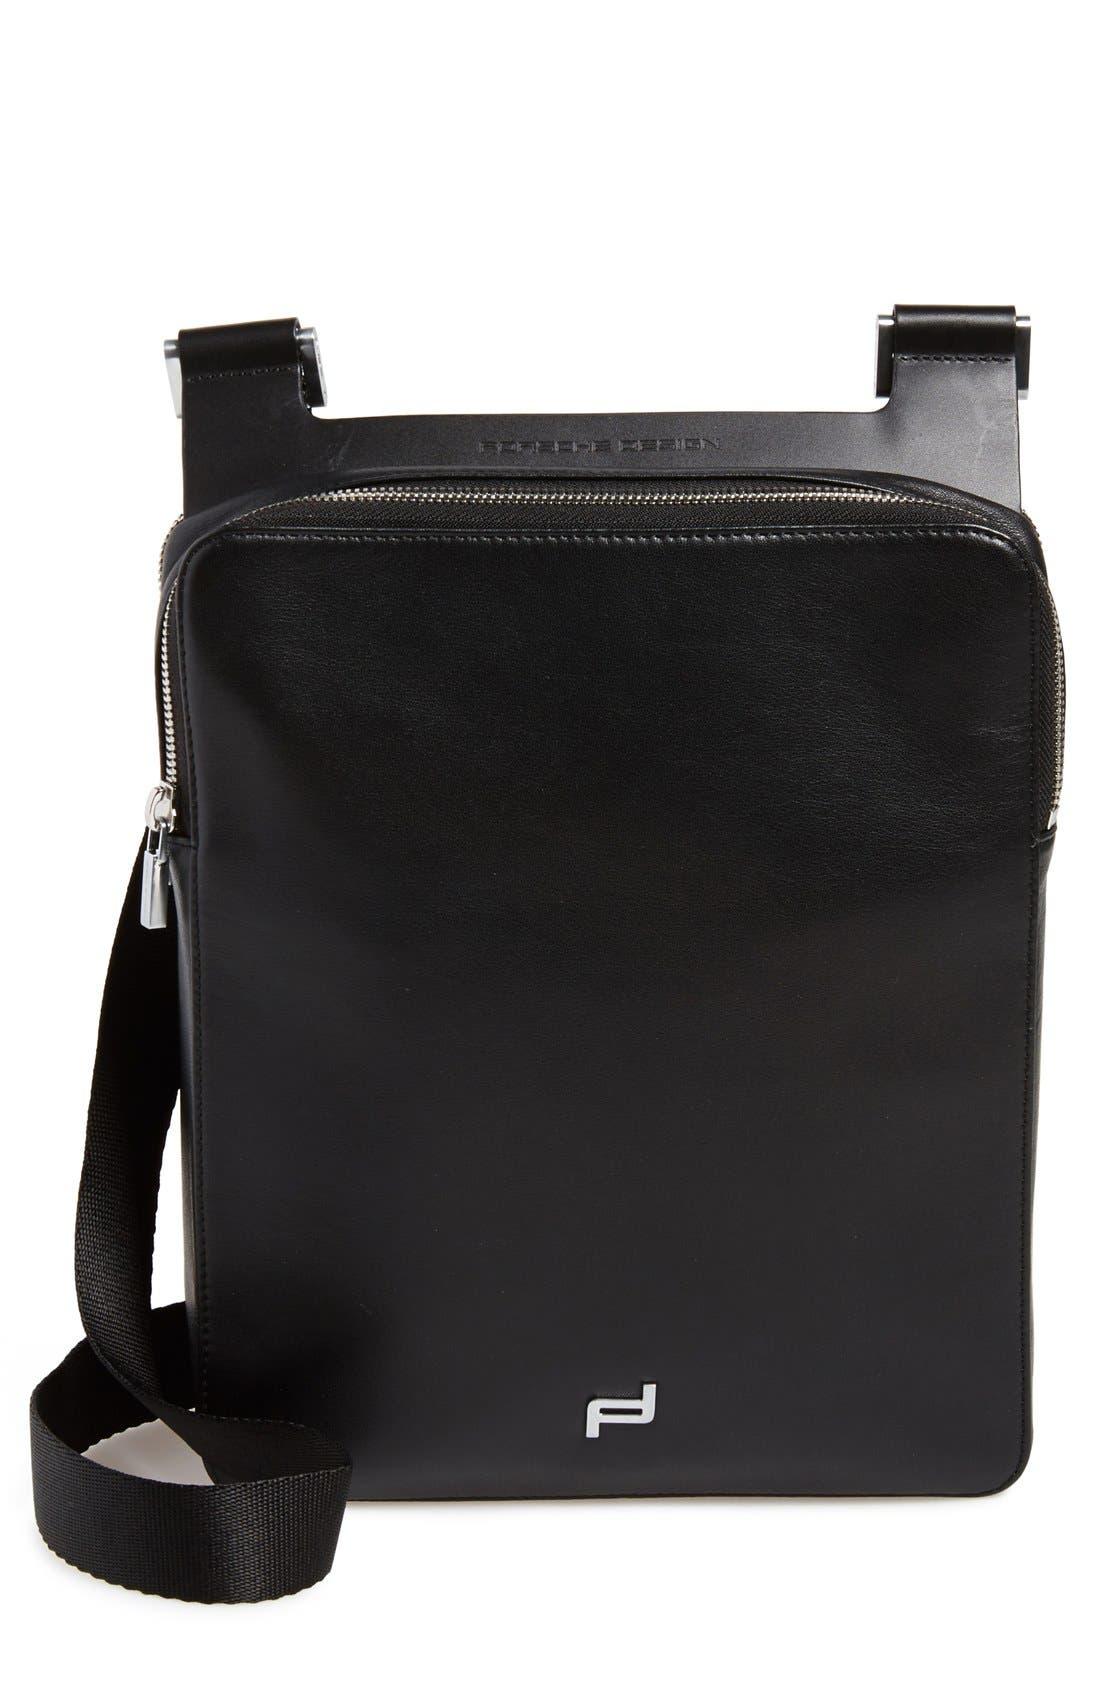 Main Image - Porsche Design 'Shyrt' City Bag